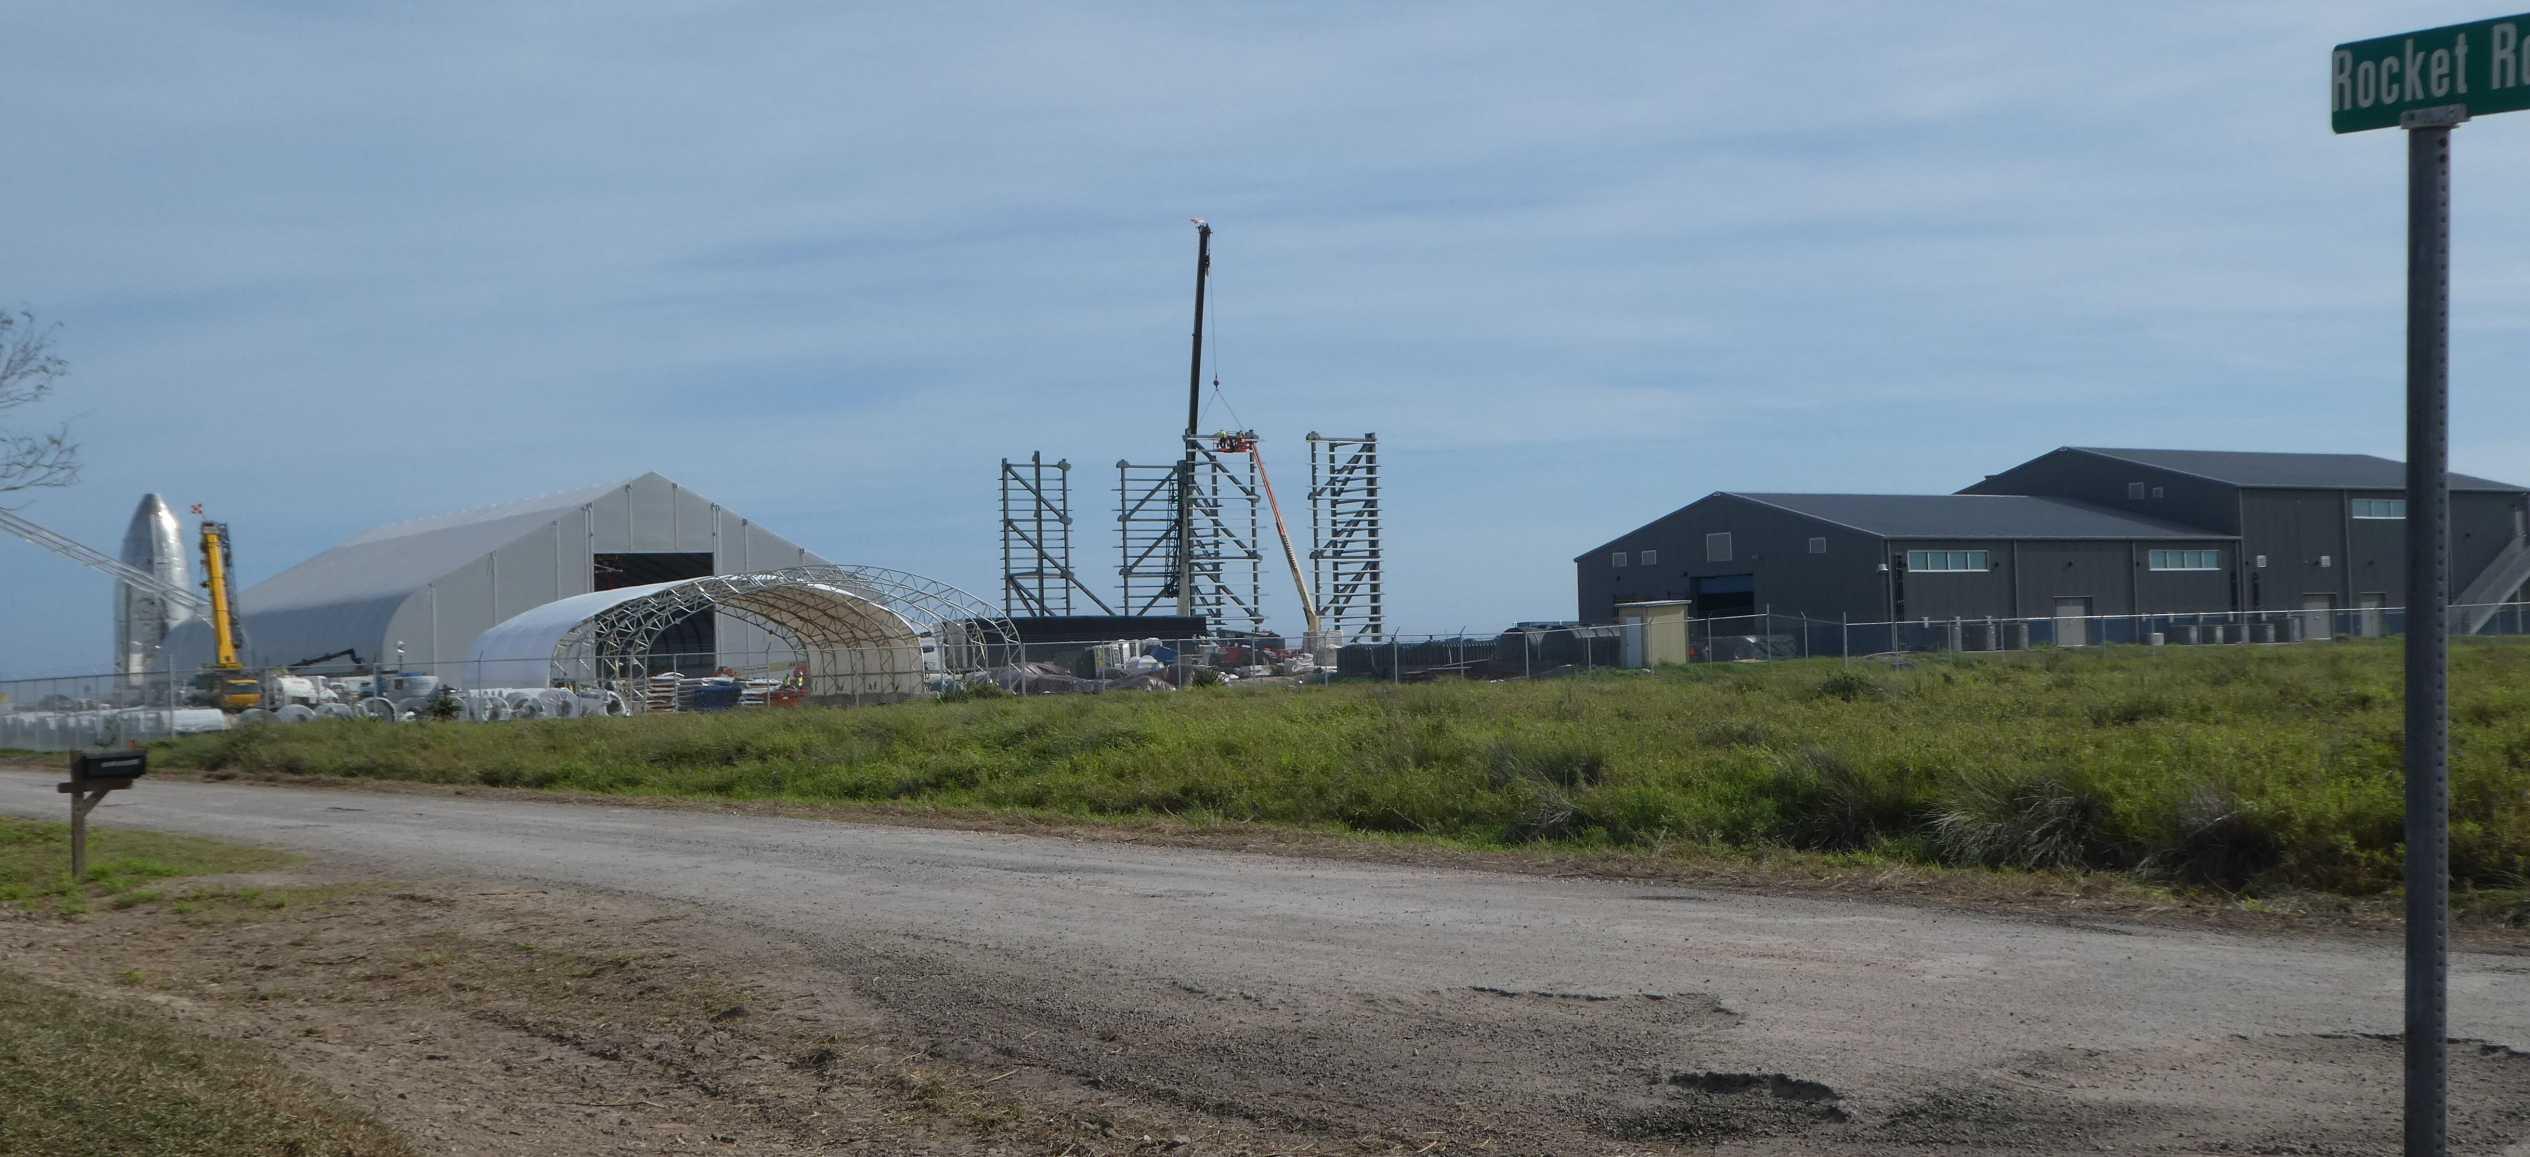 Starship Boca Chica 011720 (NASASpaceflight – Nomadd) facilities 1 crop (c)